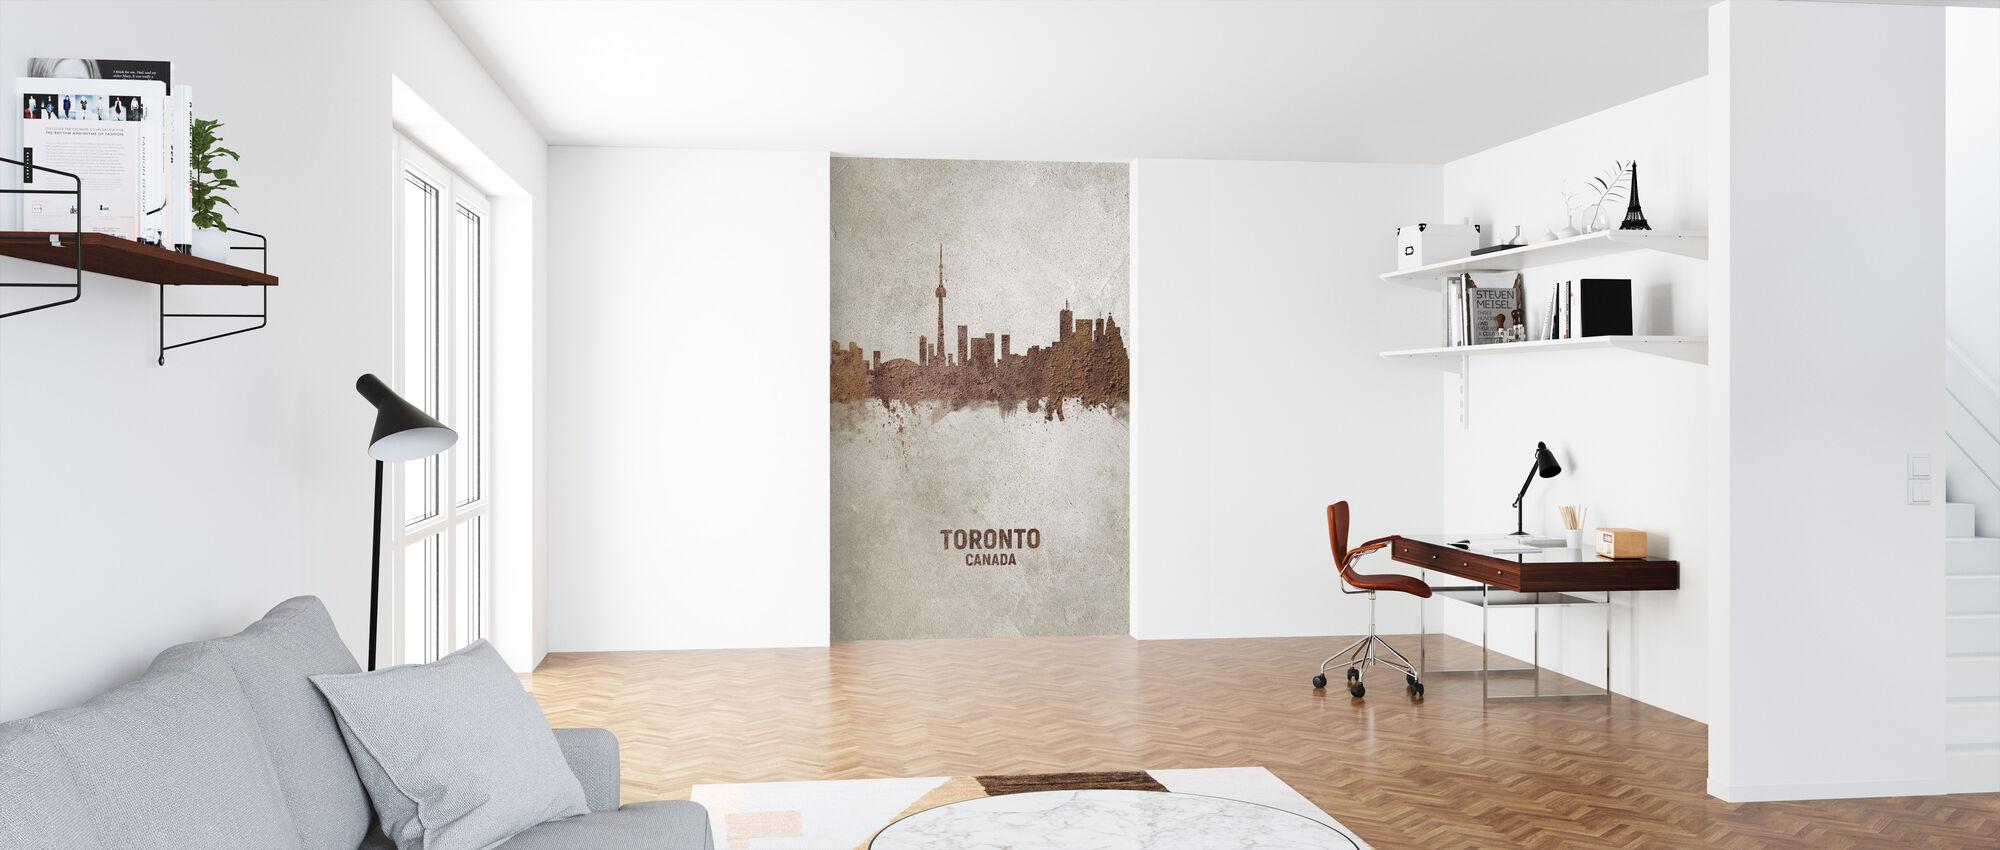 Toronto Canada Rust Skyline - Wallpaper - Office